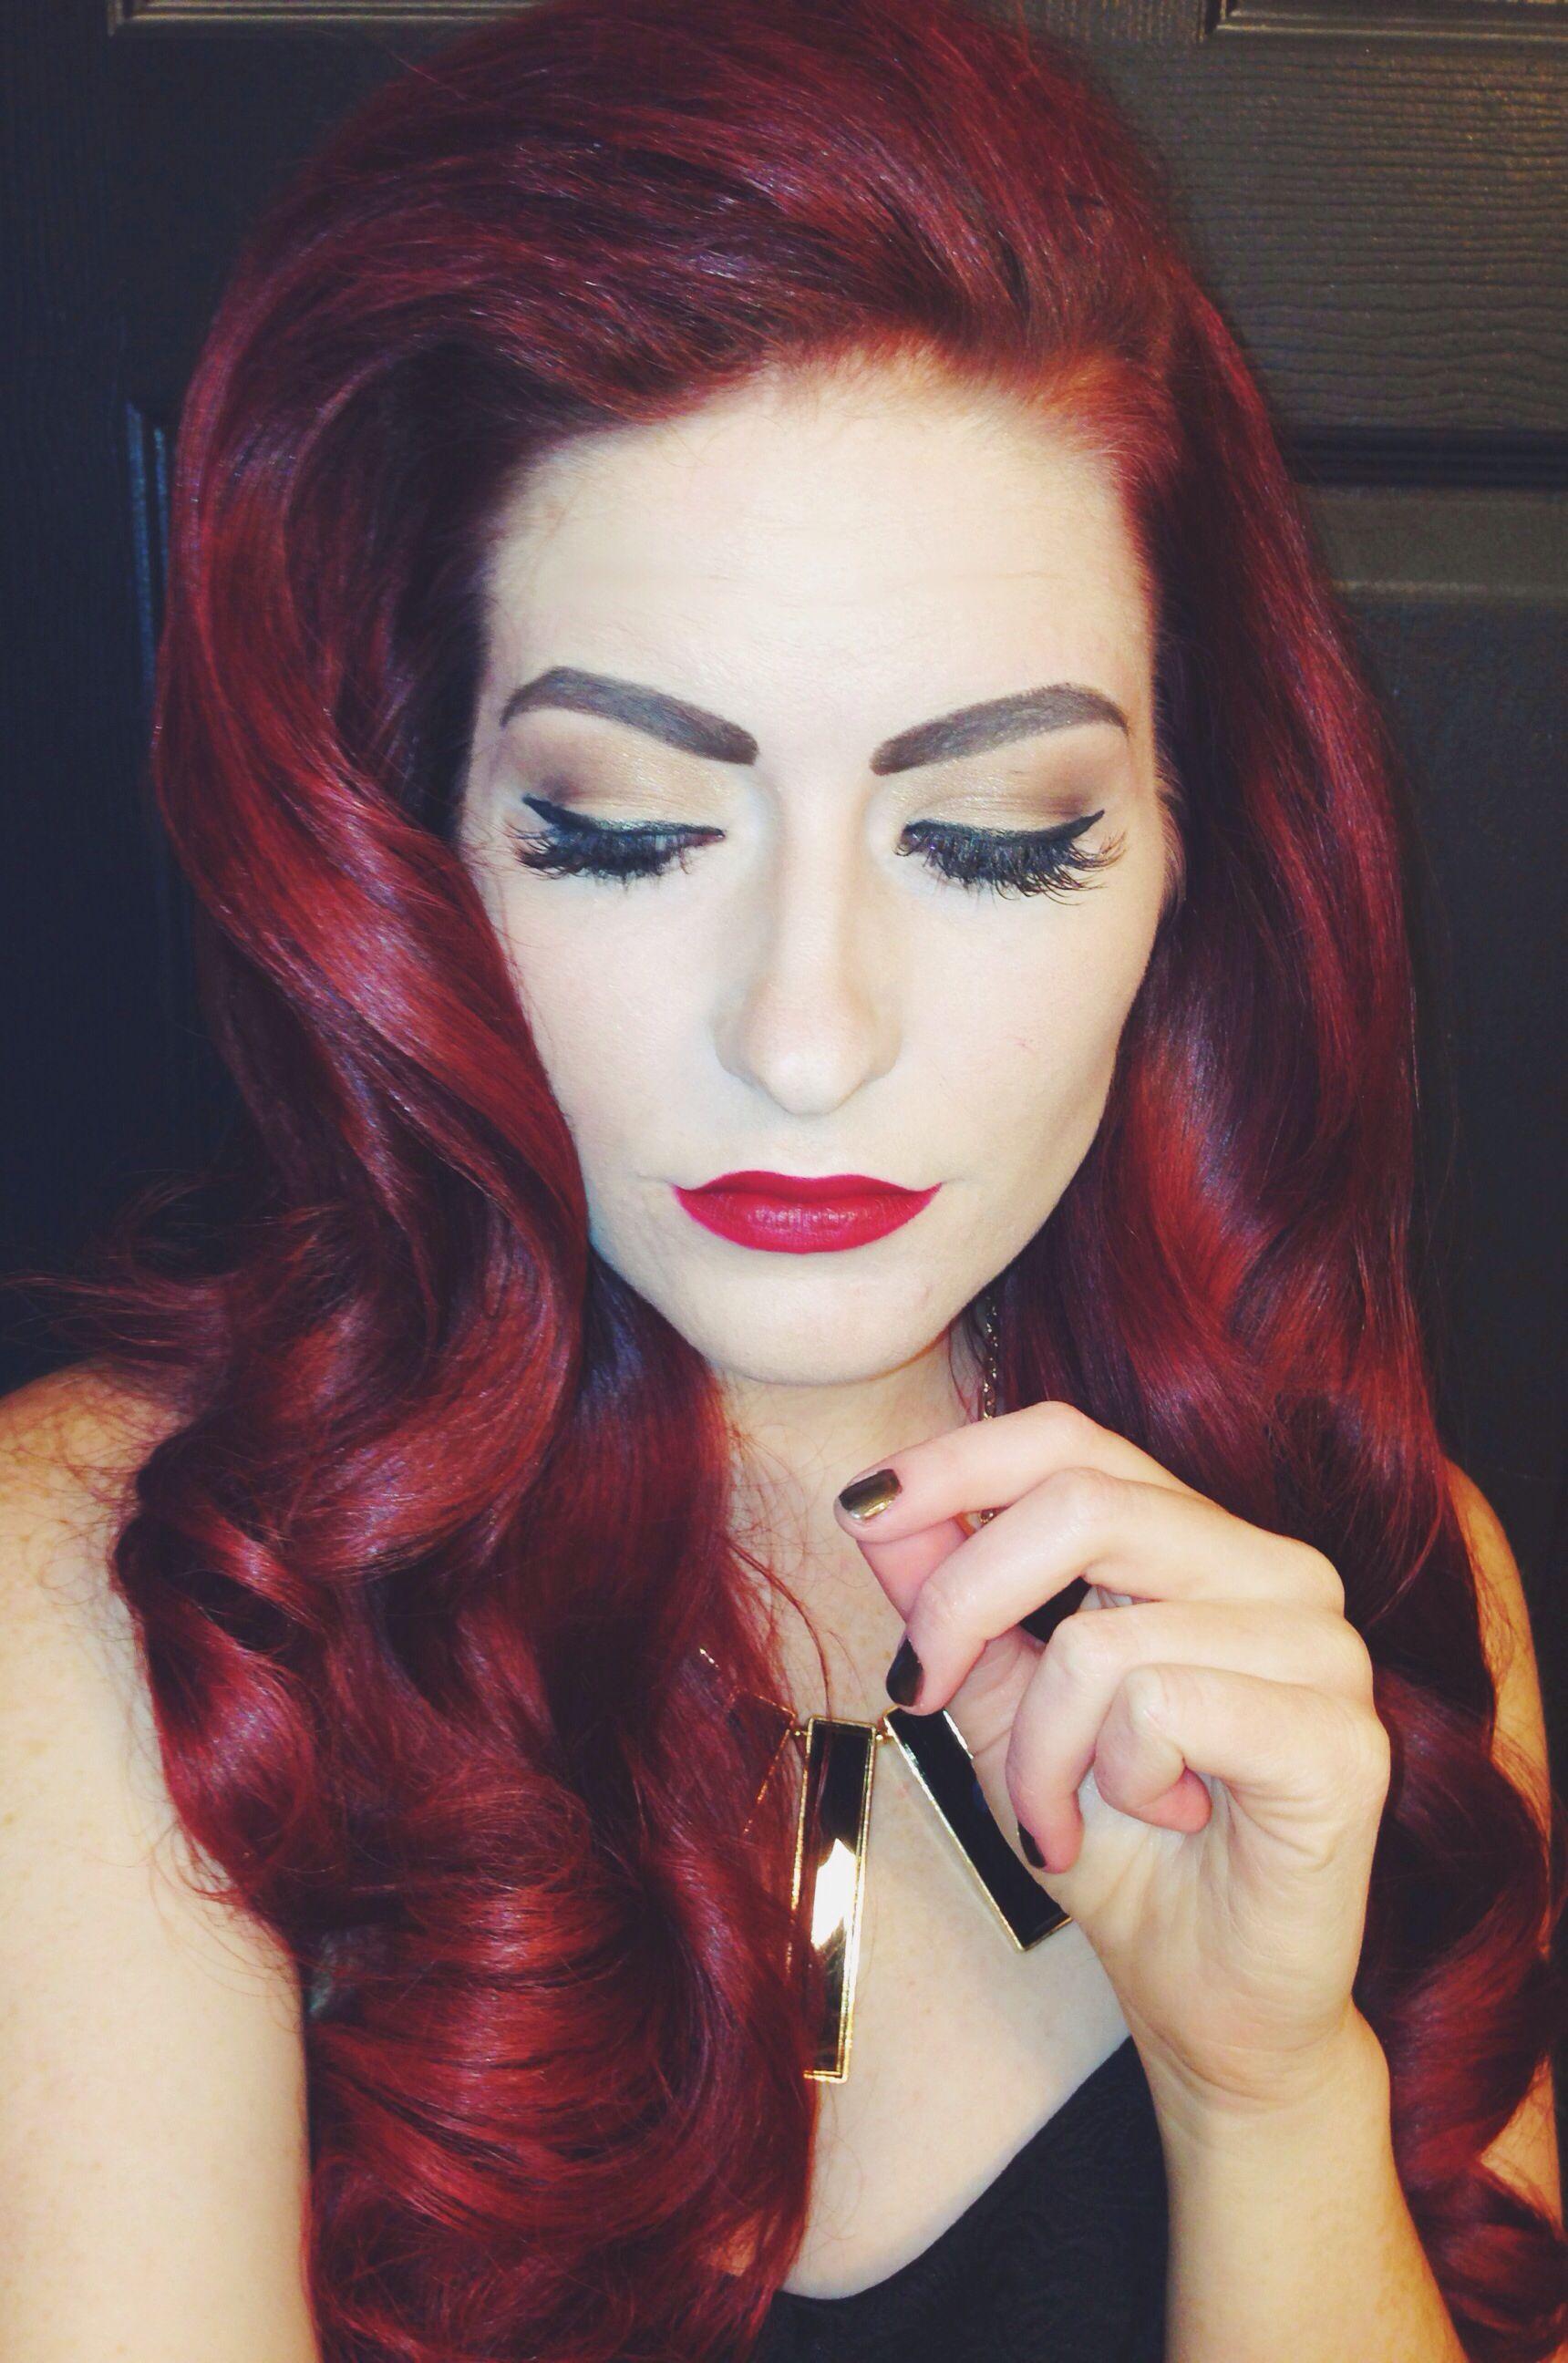 Wedding Makeup Ideas For Redheads : Wedding Makeup Redhead on Pinterest Wedding makeup ...